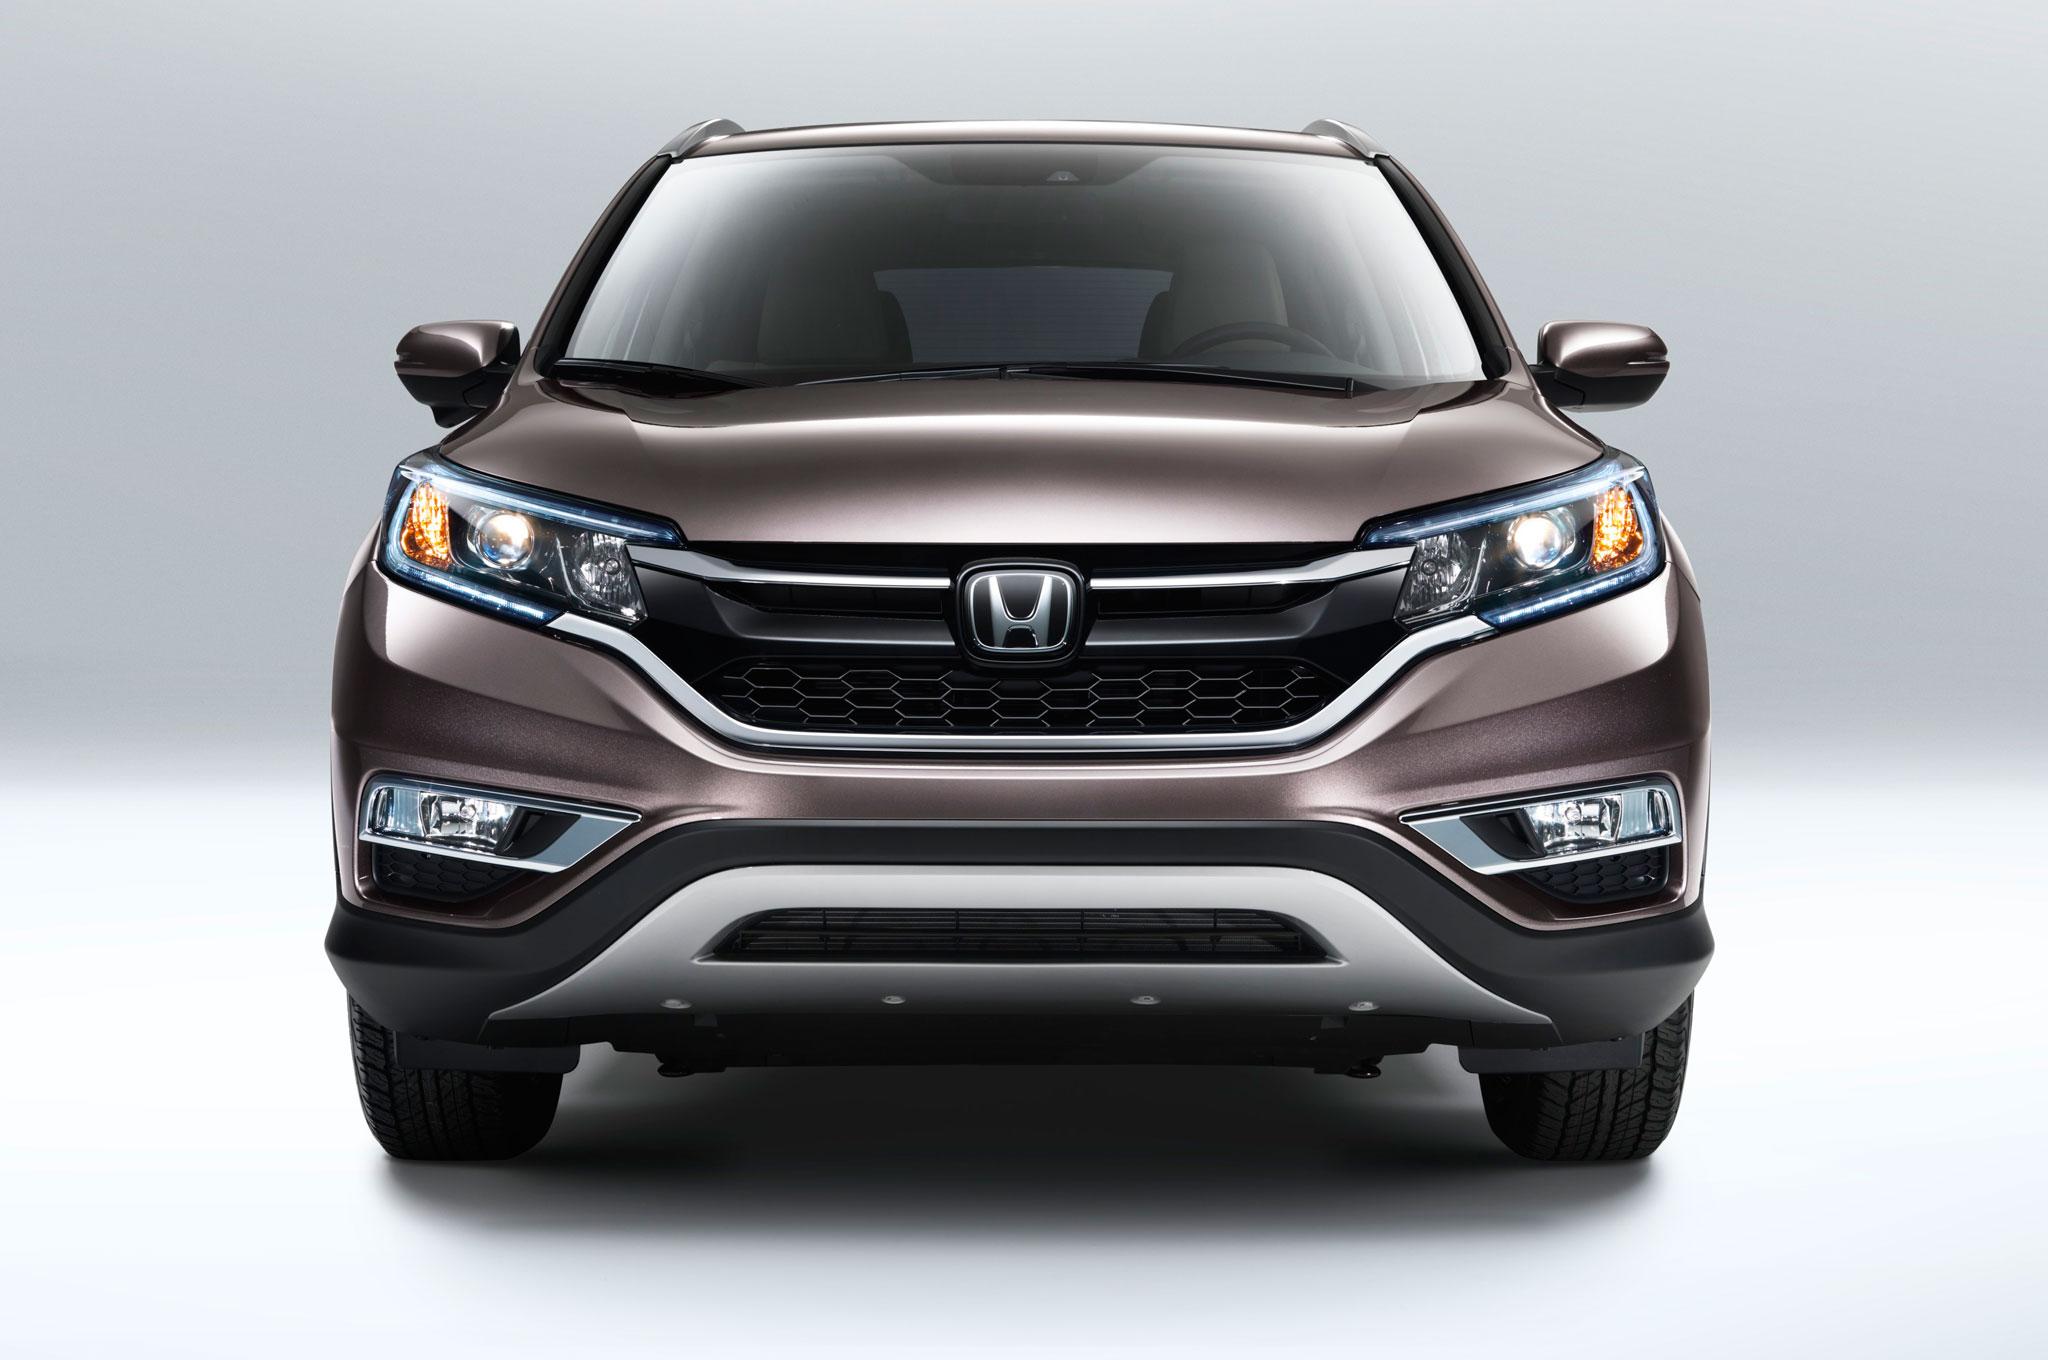 2015 Honda CR-V Refreshed with New Engine, Improved MPG